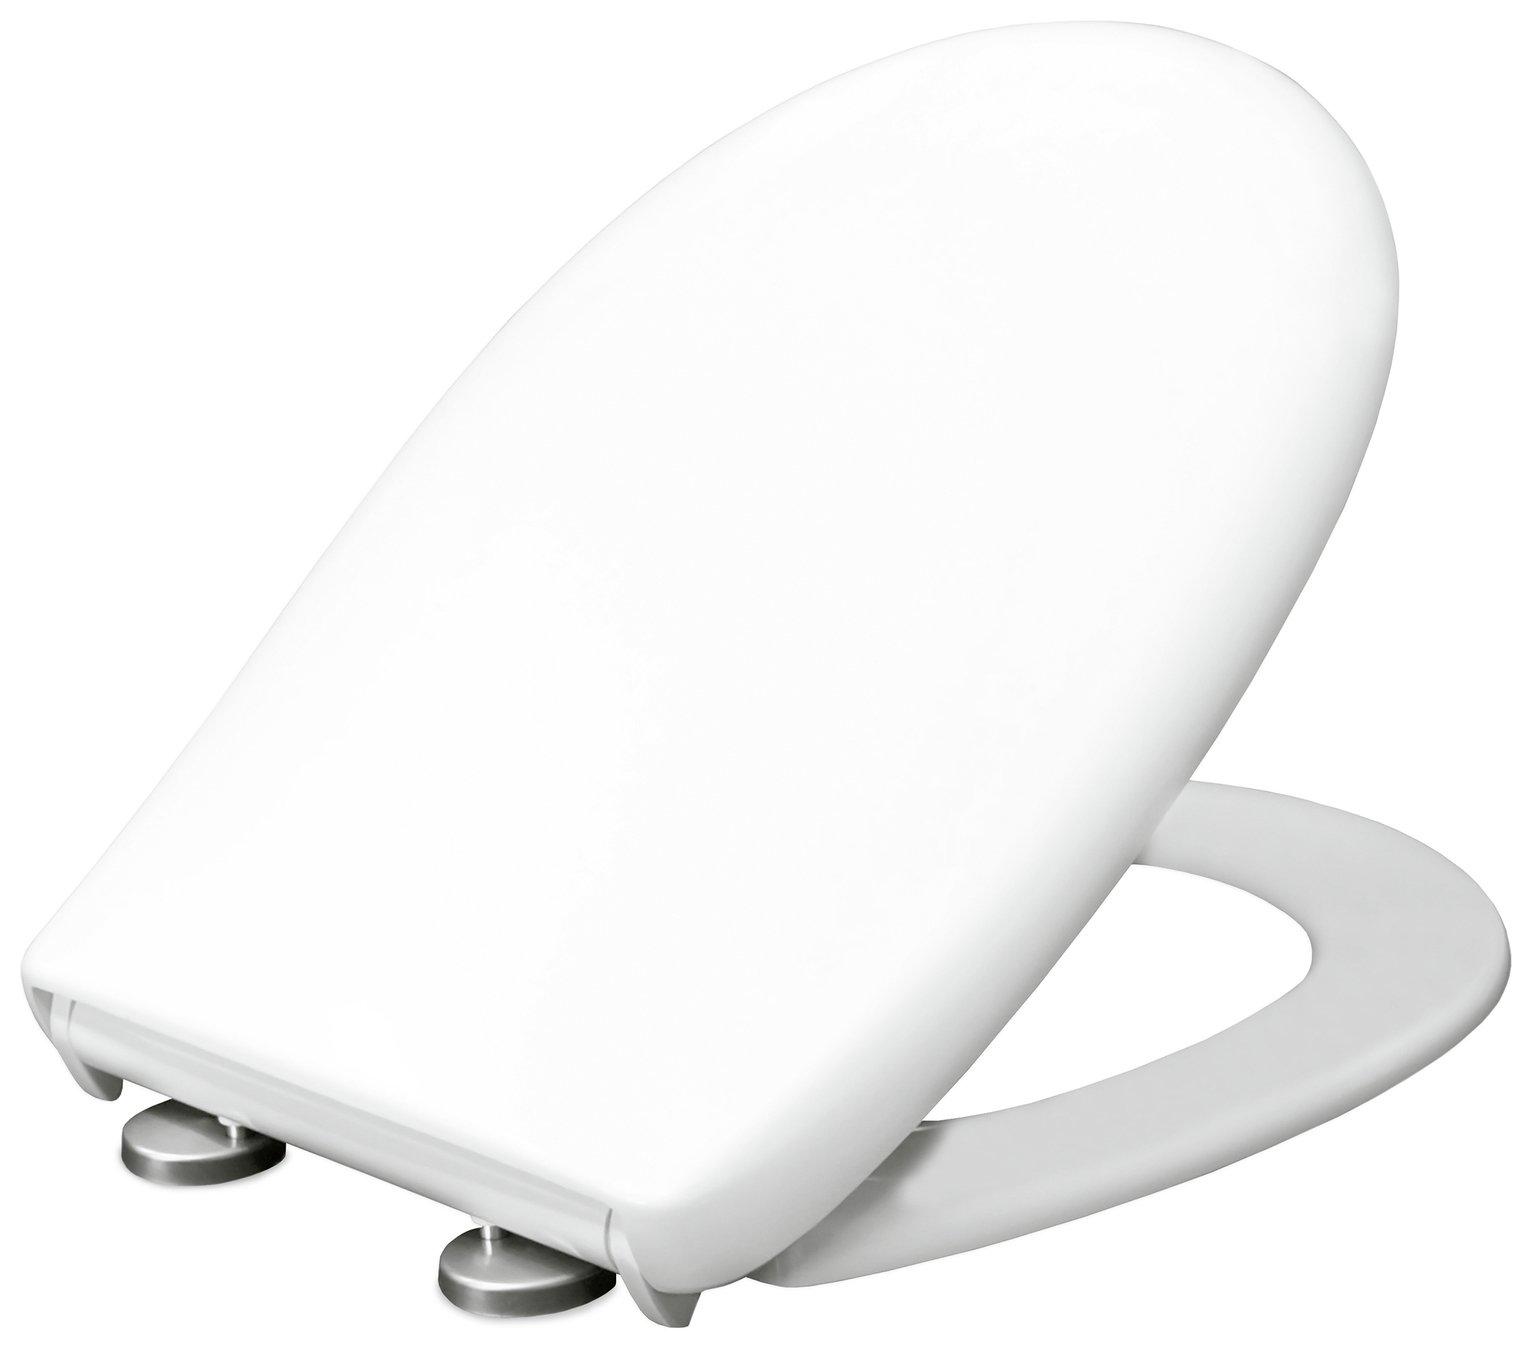 Bemis Classic Push and Clean Toilet Seat